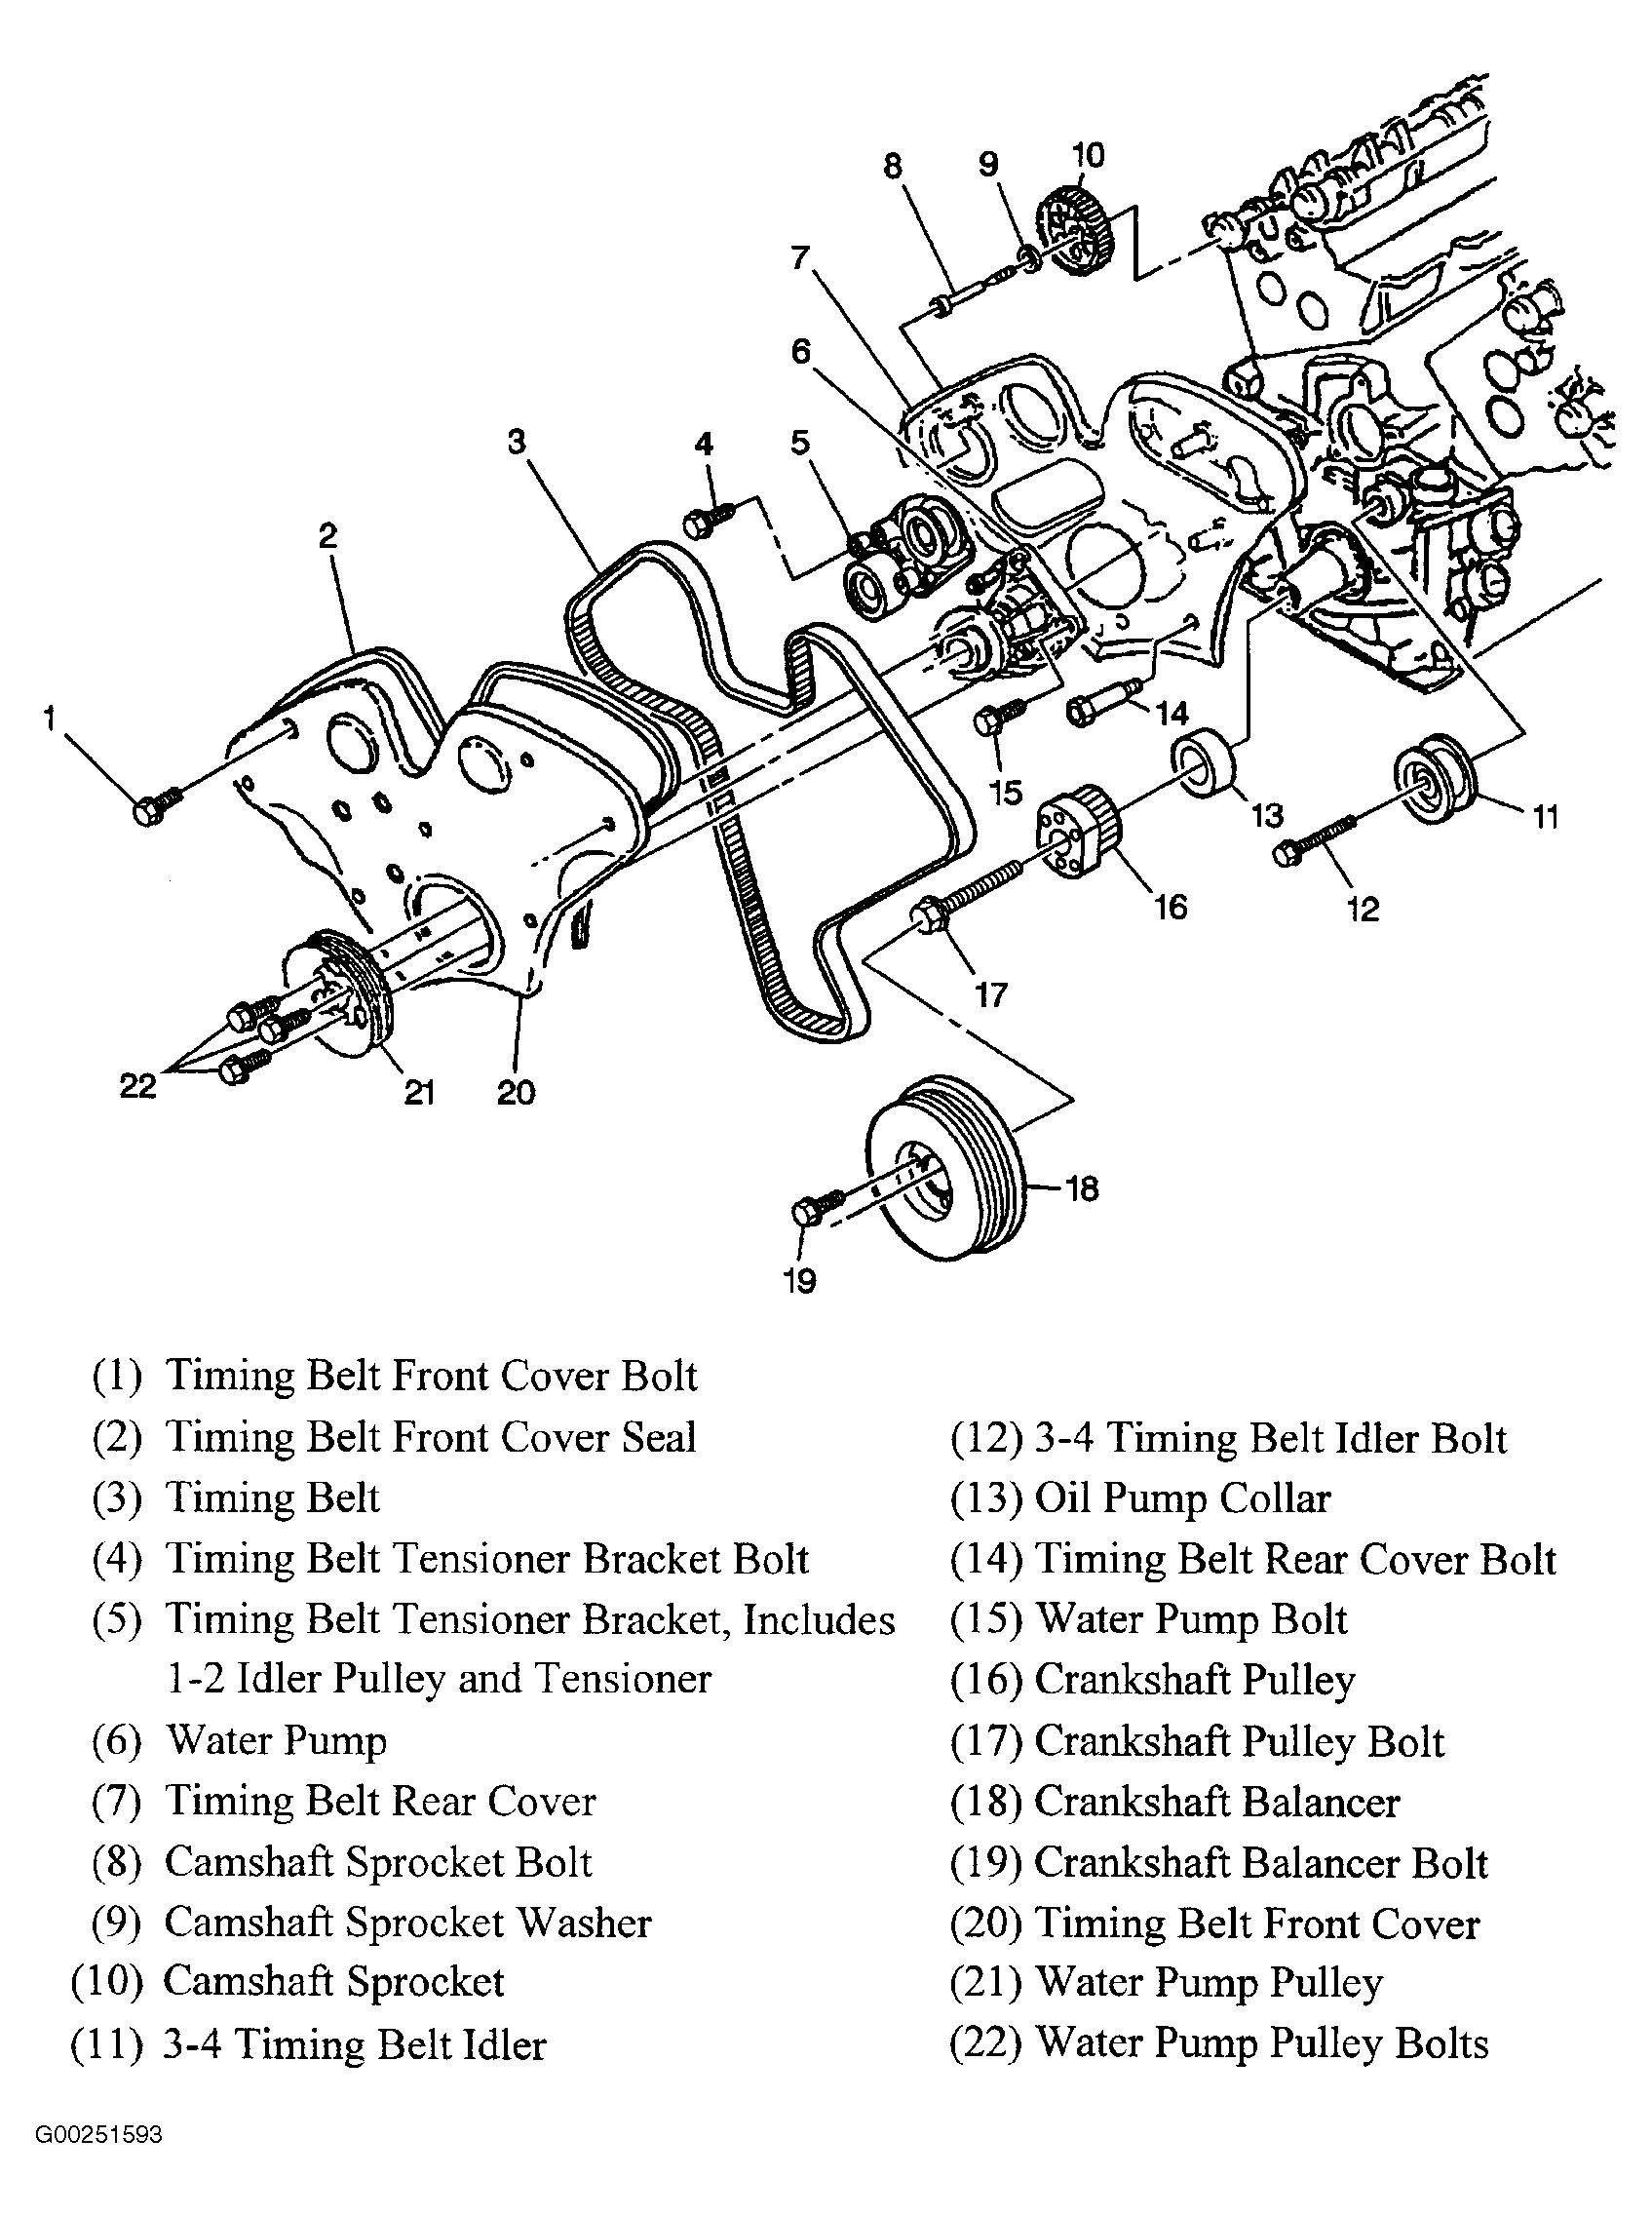 Car Engine Oil Flow Diagram Hyundai Body Parts Diagram Of Car Engine Oil Flow Diagram